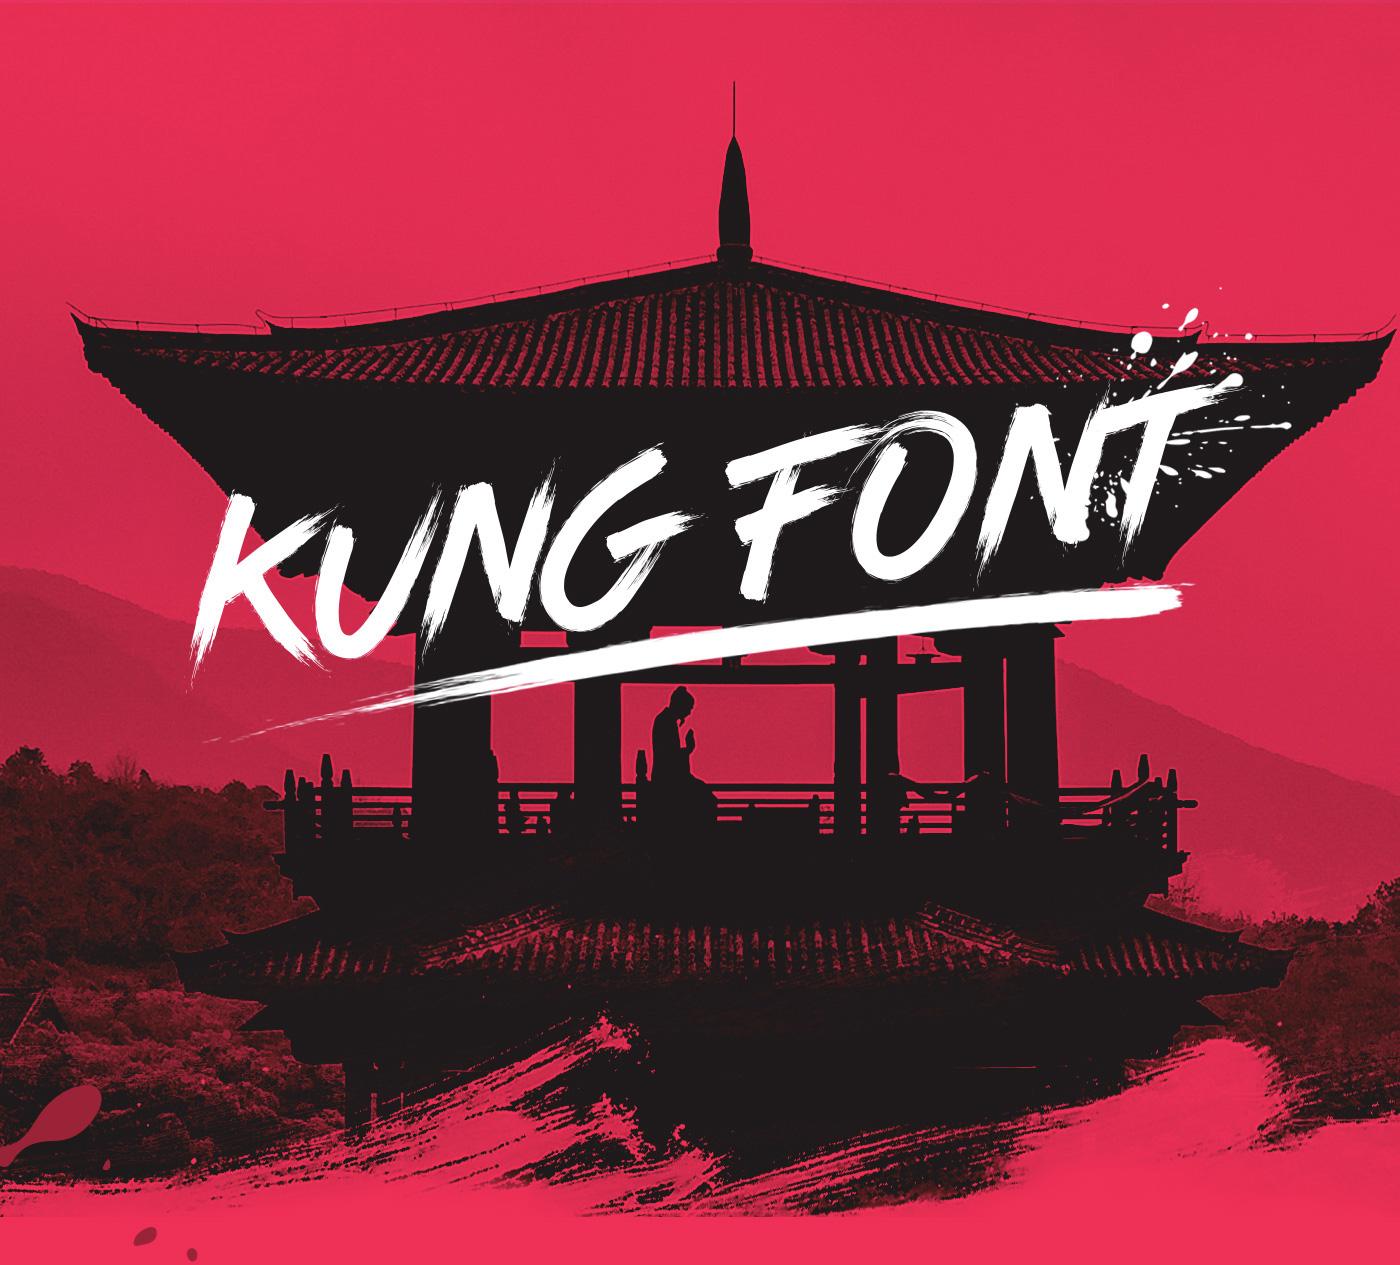 font Free font freefont typography   type lettering brush brush type Brush font handwriting handmade